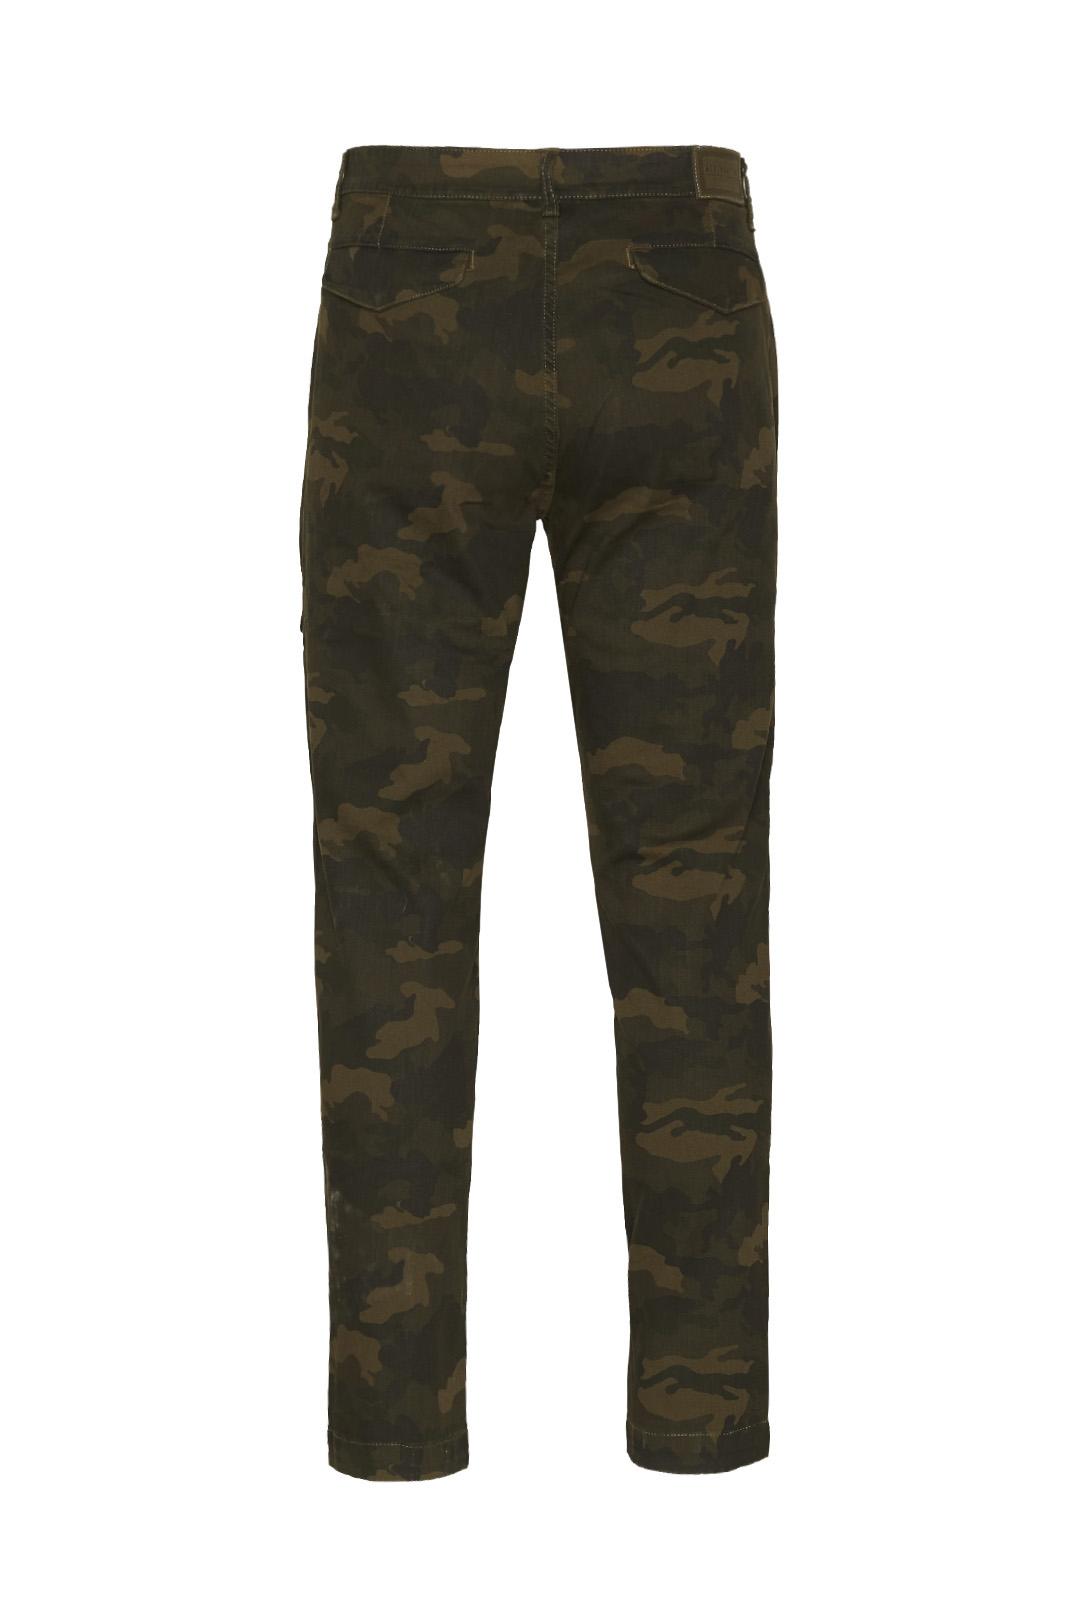 Pantalon multipoches camouflge           2